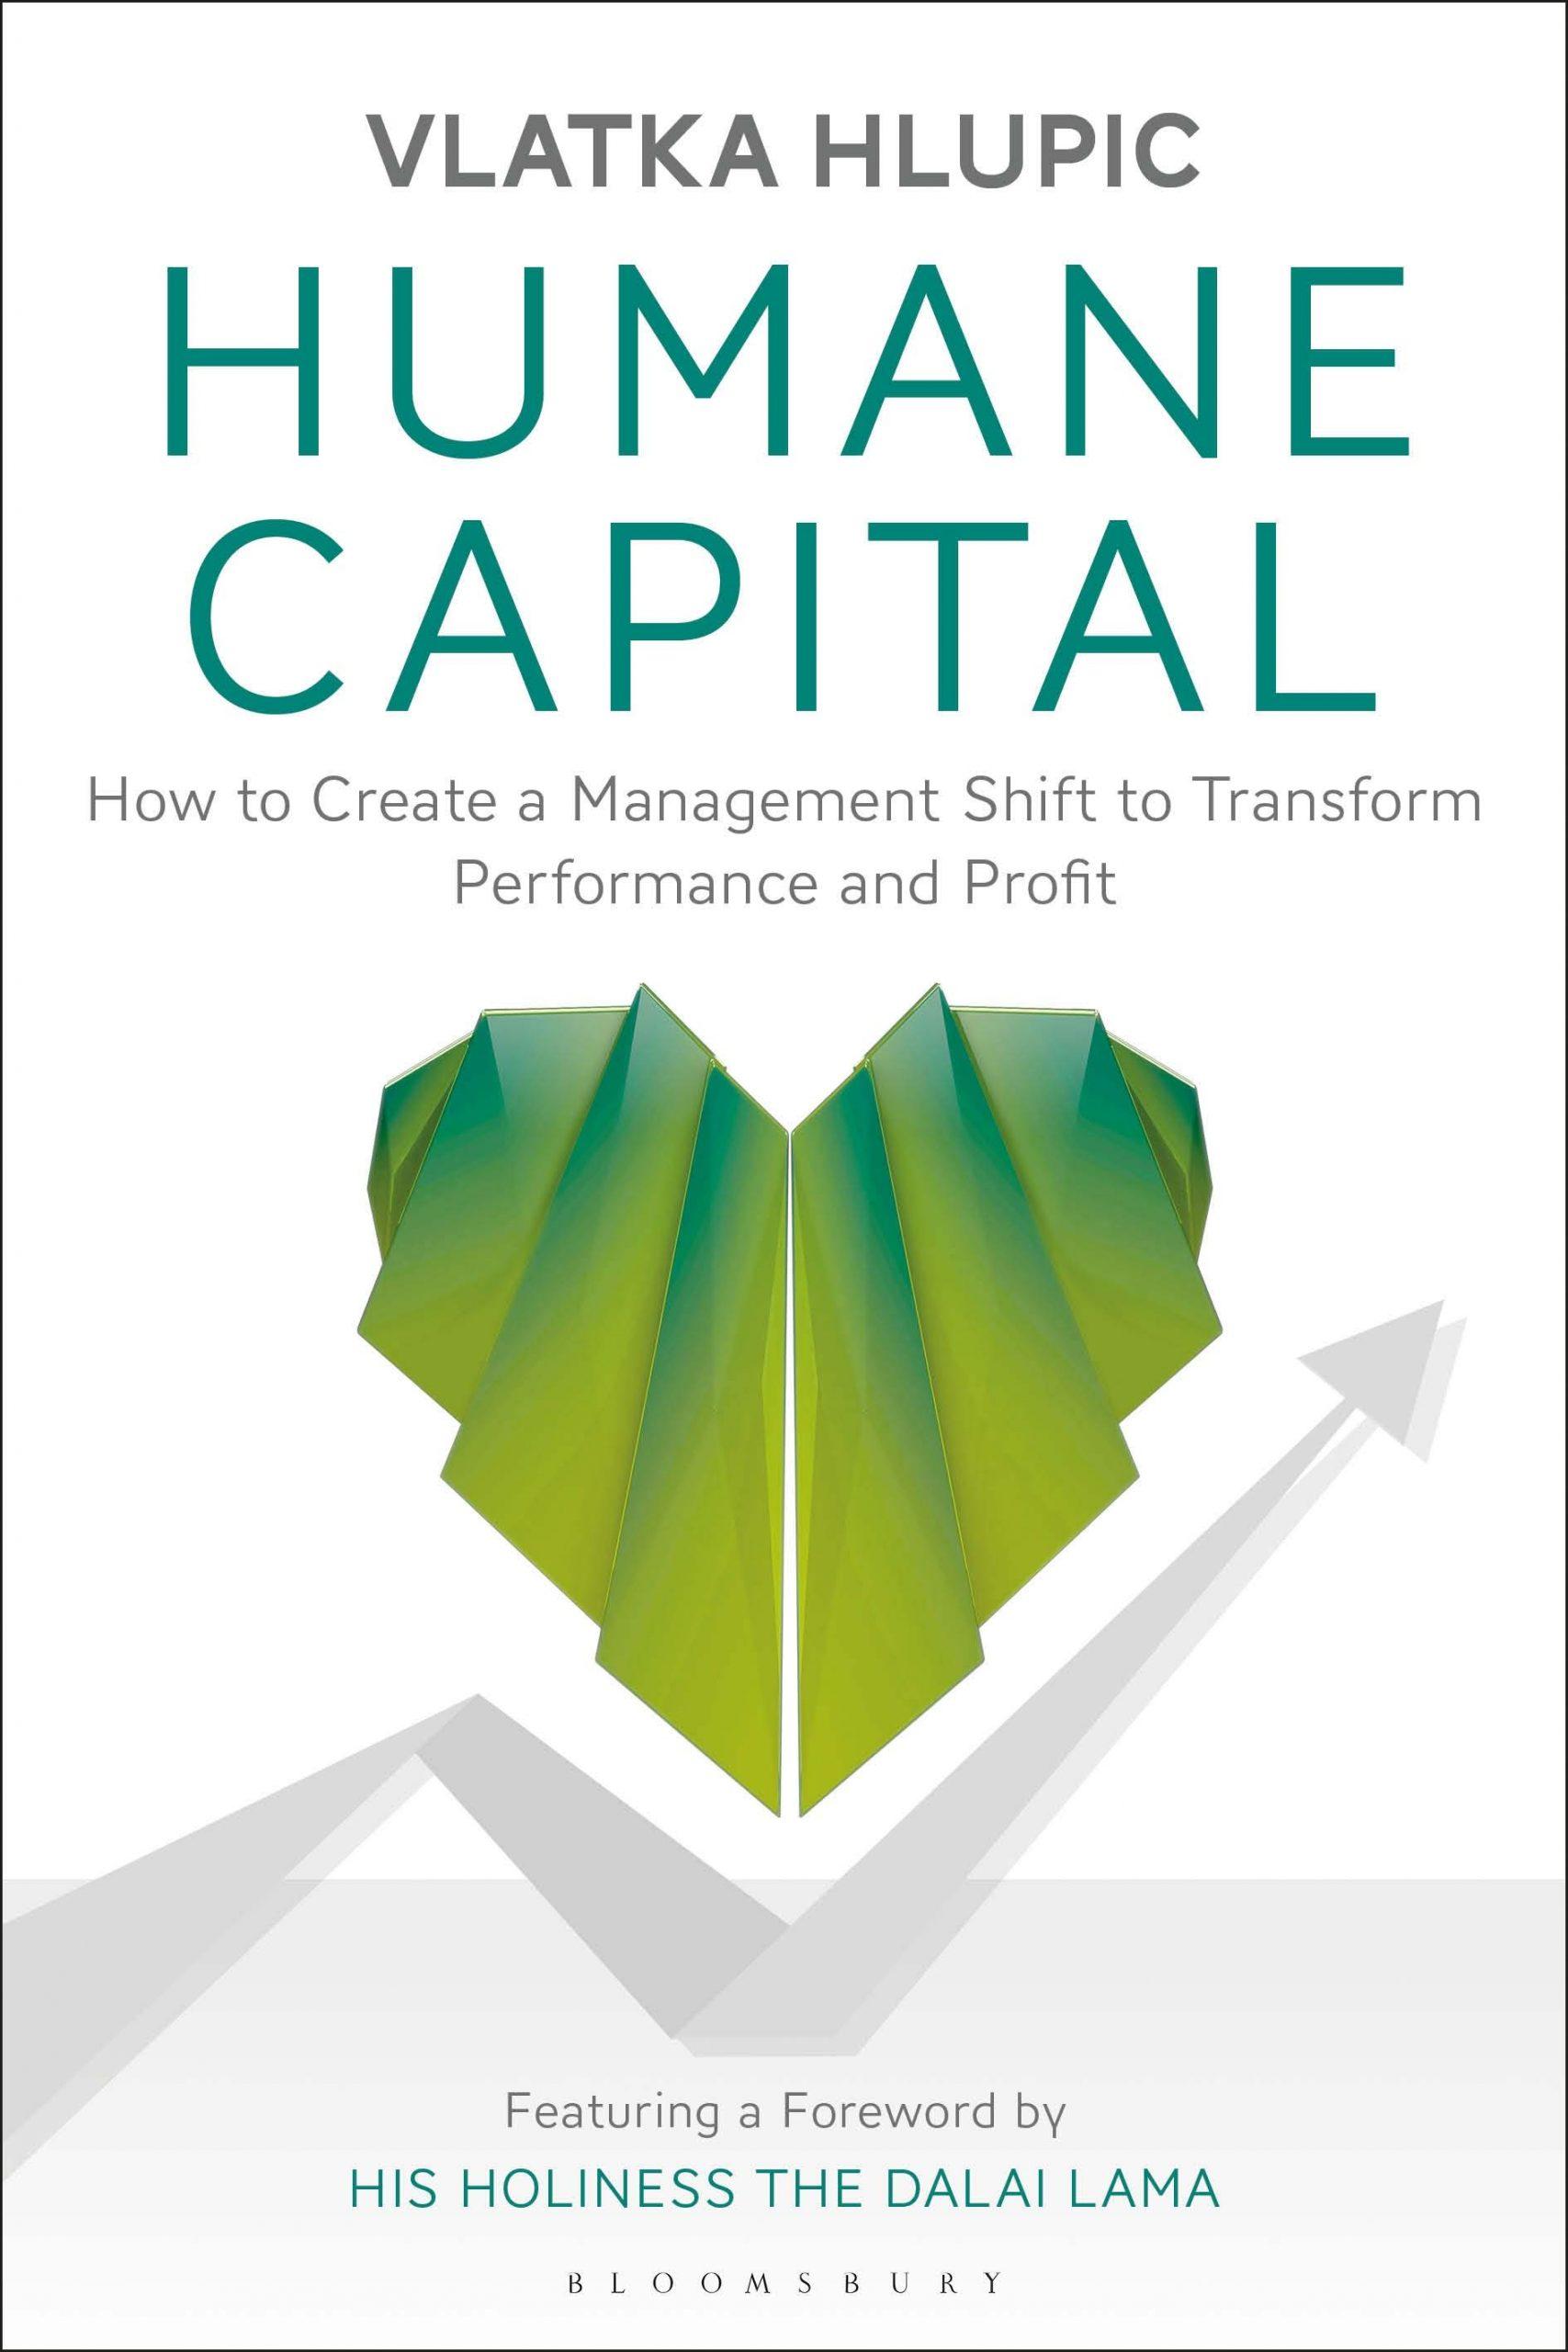 Humane Capital